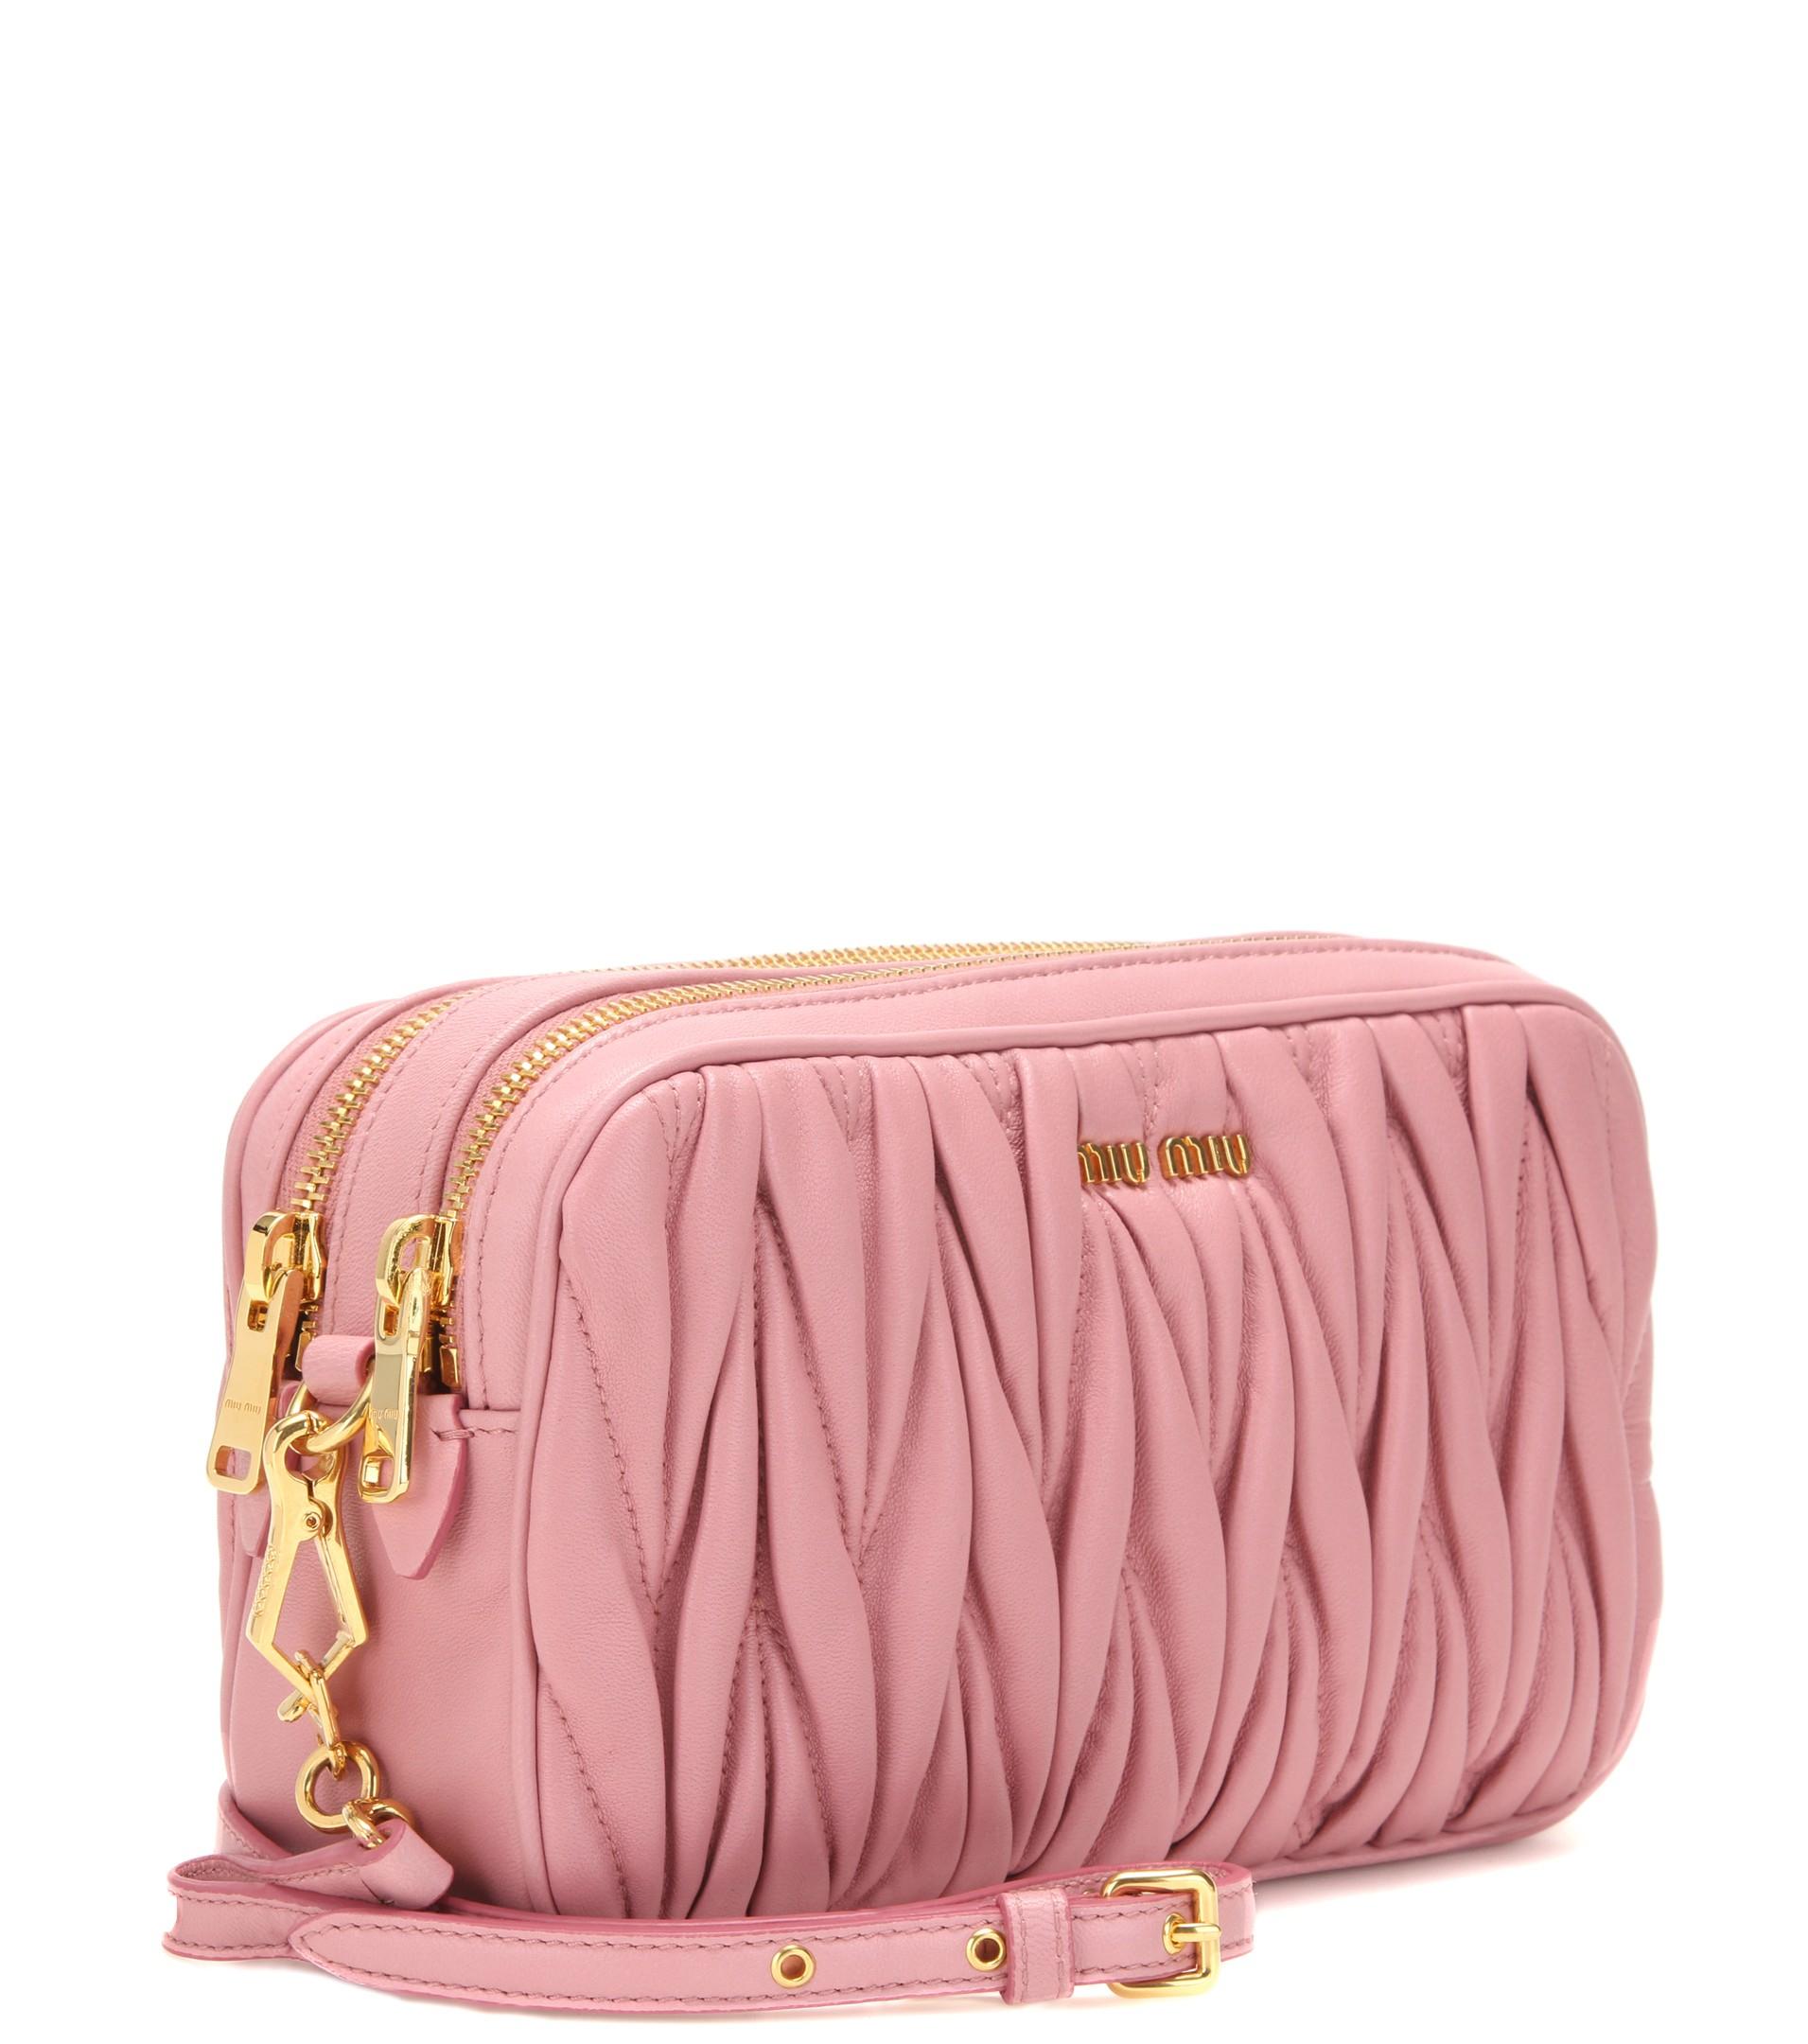 10aca4acc01b Miu Miu Matelassé Leather Shoulder Bag in Pink - Lyst